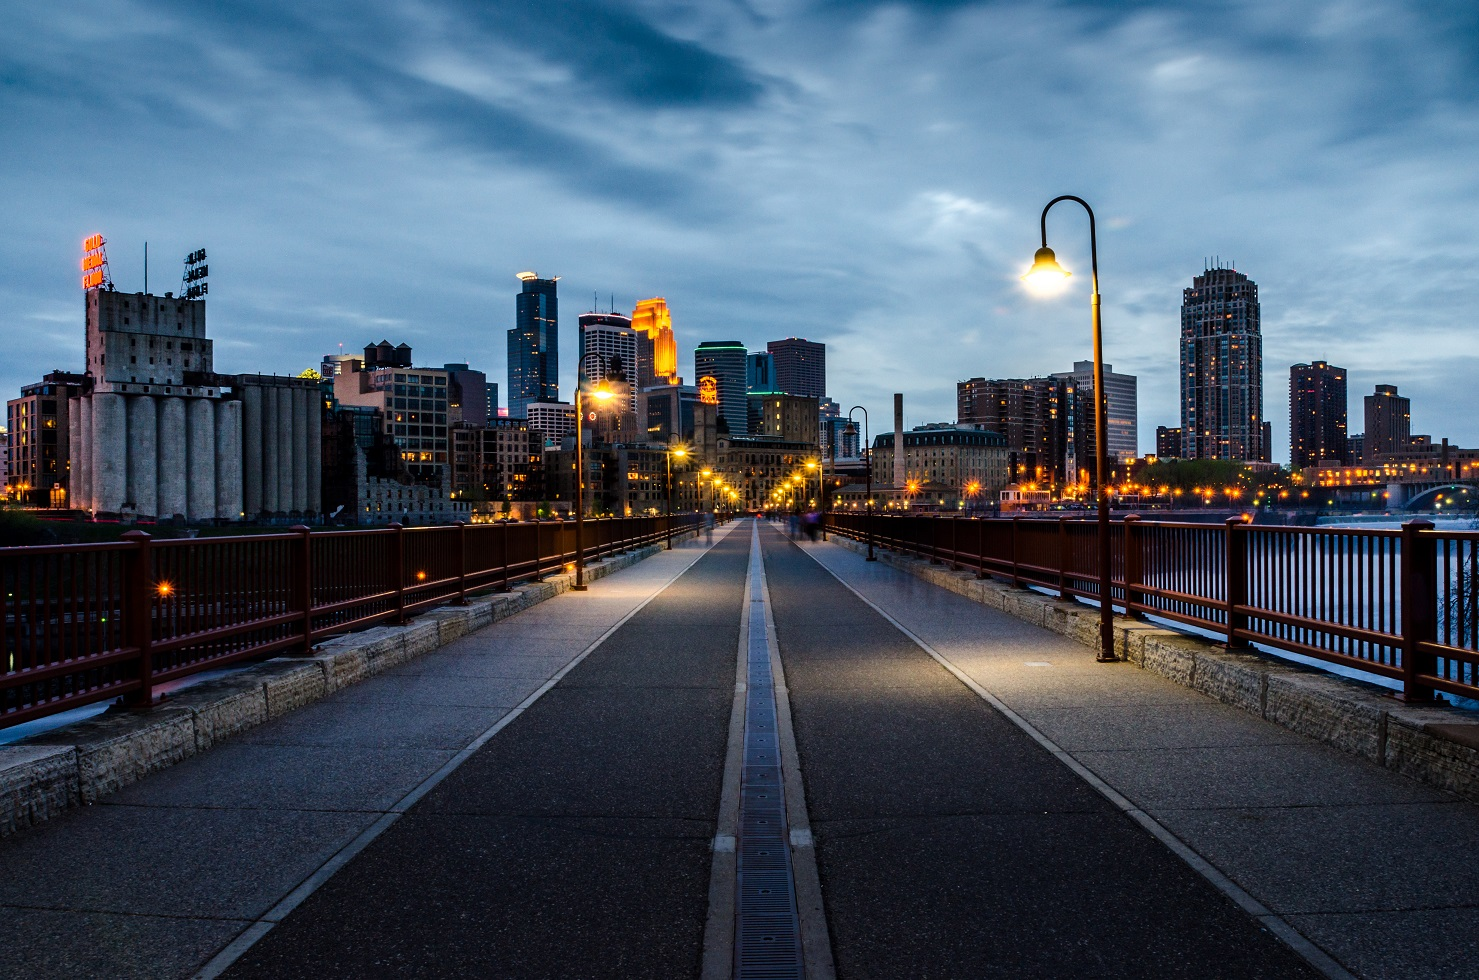 Bridge at night edit